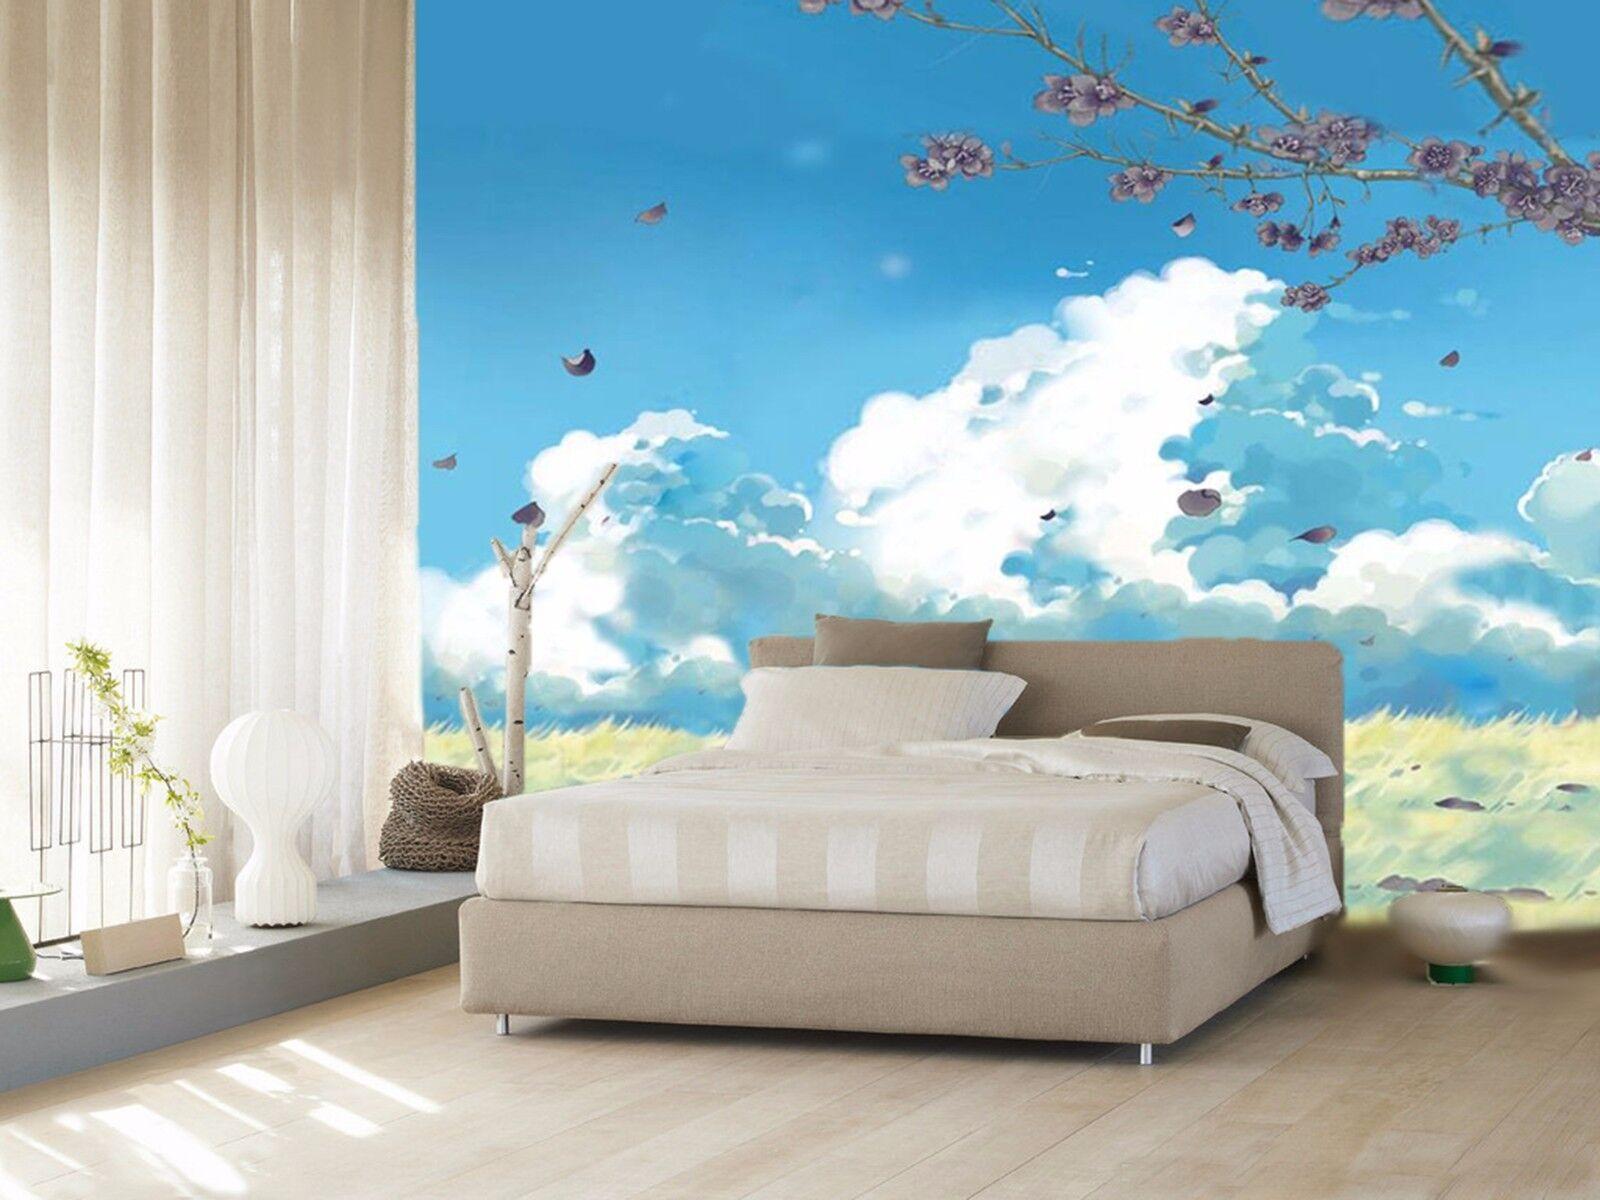 3D Blauer Himmel wolken6 Wandbild Fototapete Bild Tapete Familie Kinder DE Lemon